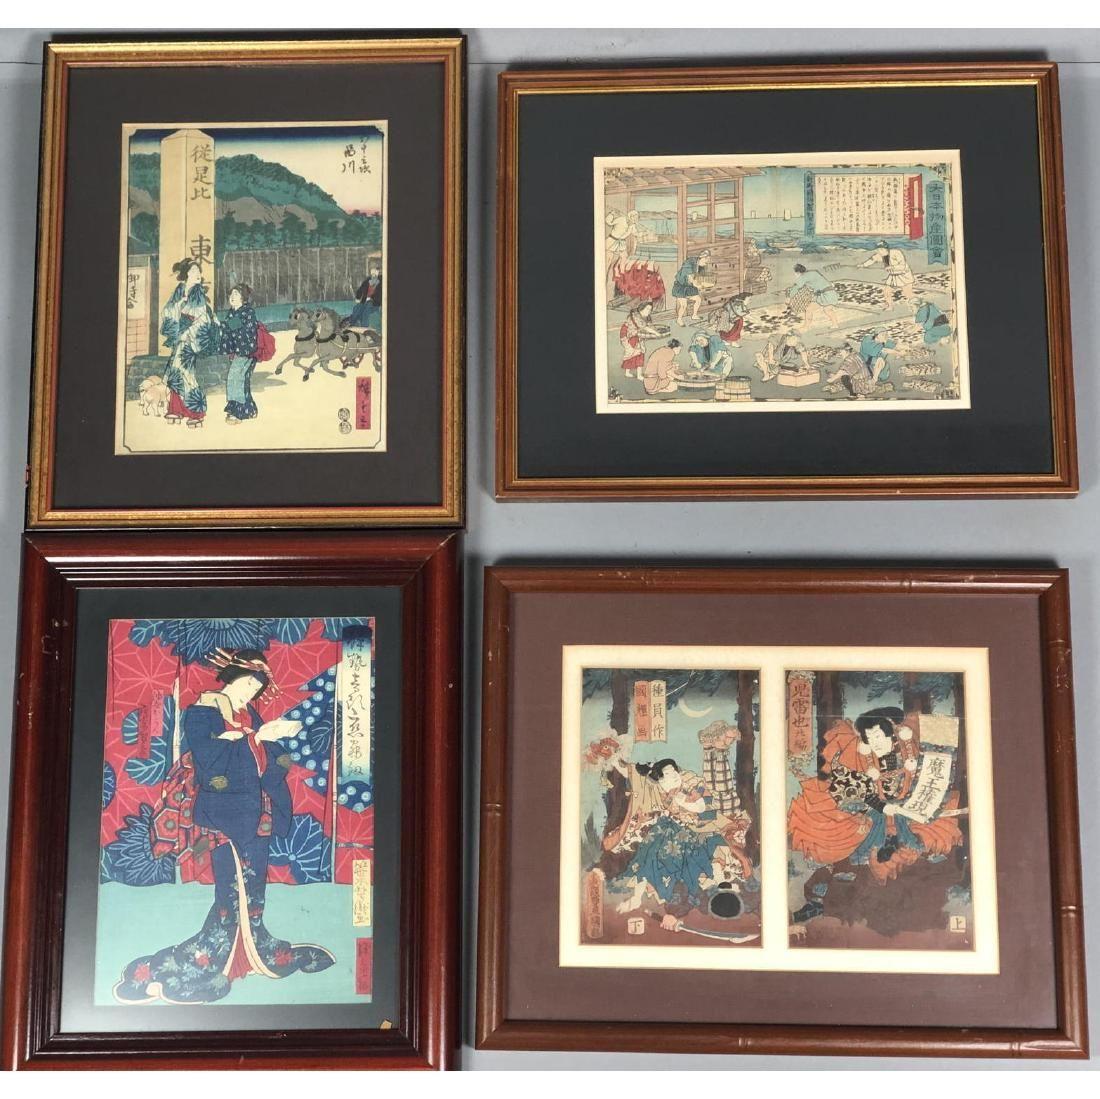 4pc Japanese Wood Block Prints Signed. 2 prints w